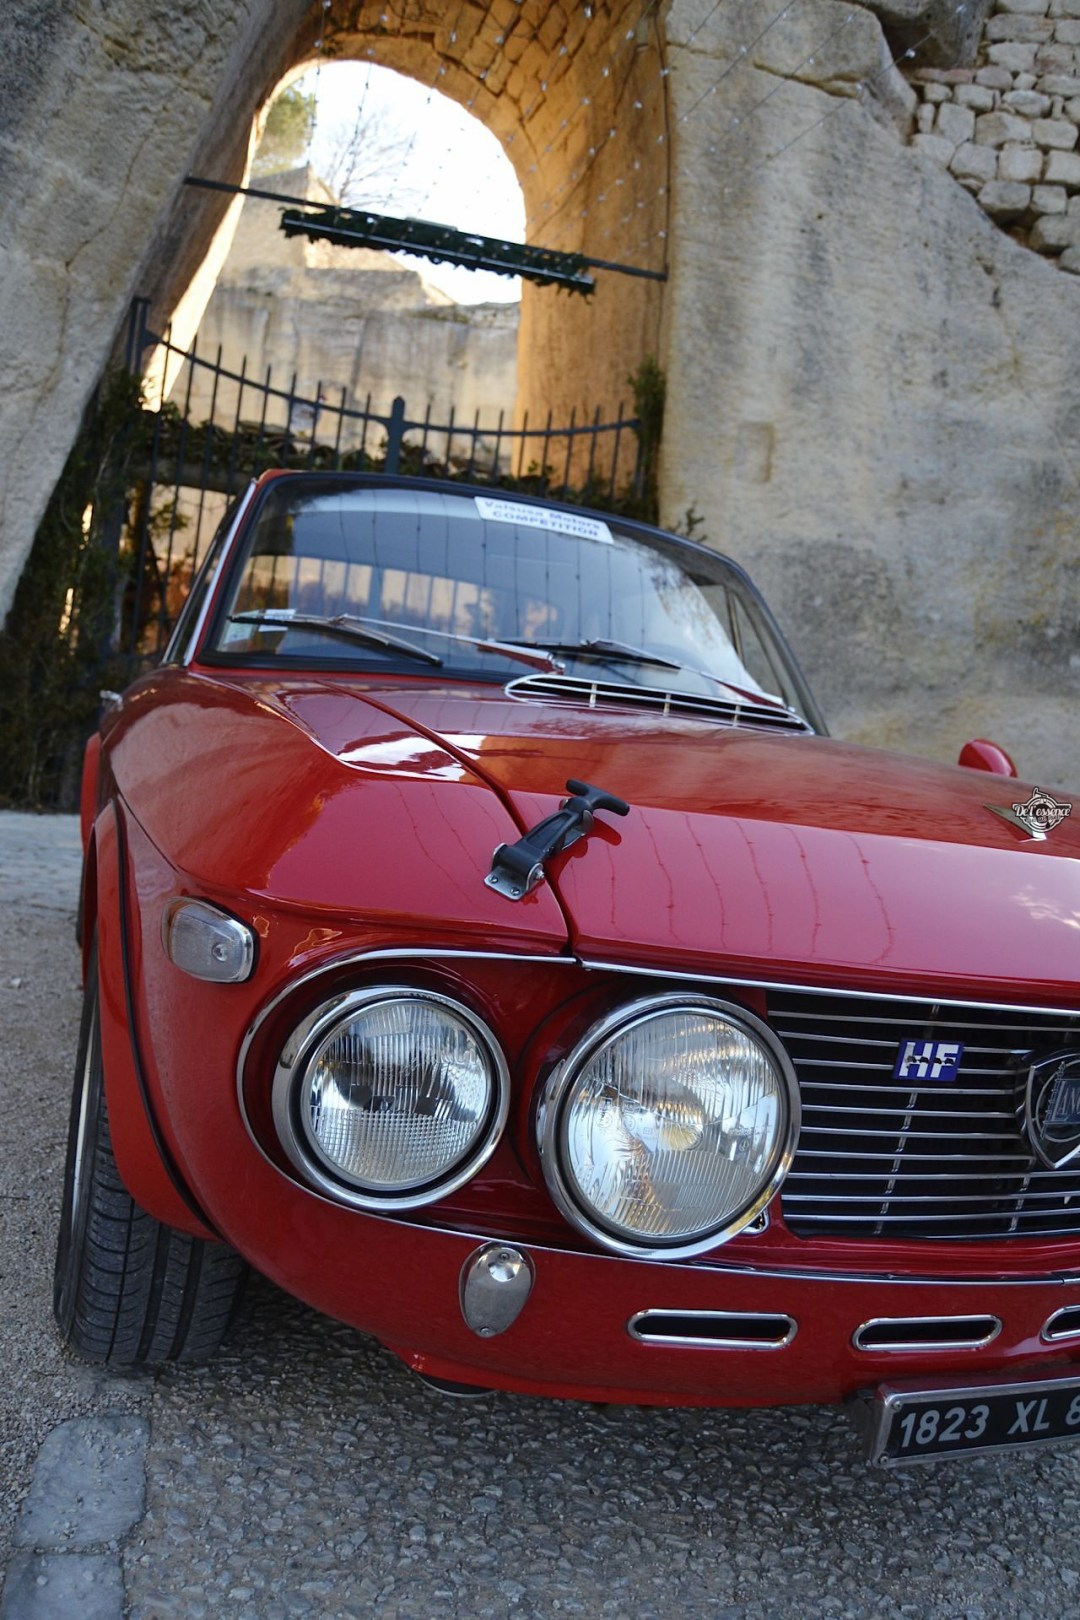 Lancia Fulvia HF Fanalone - Belissima leggenda ! 104